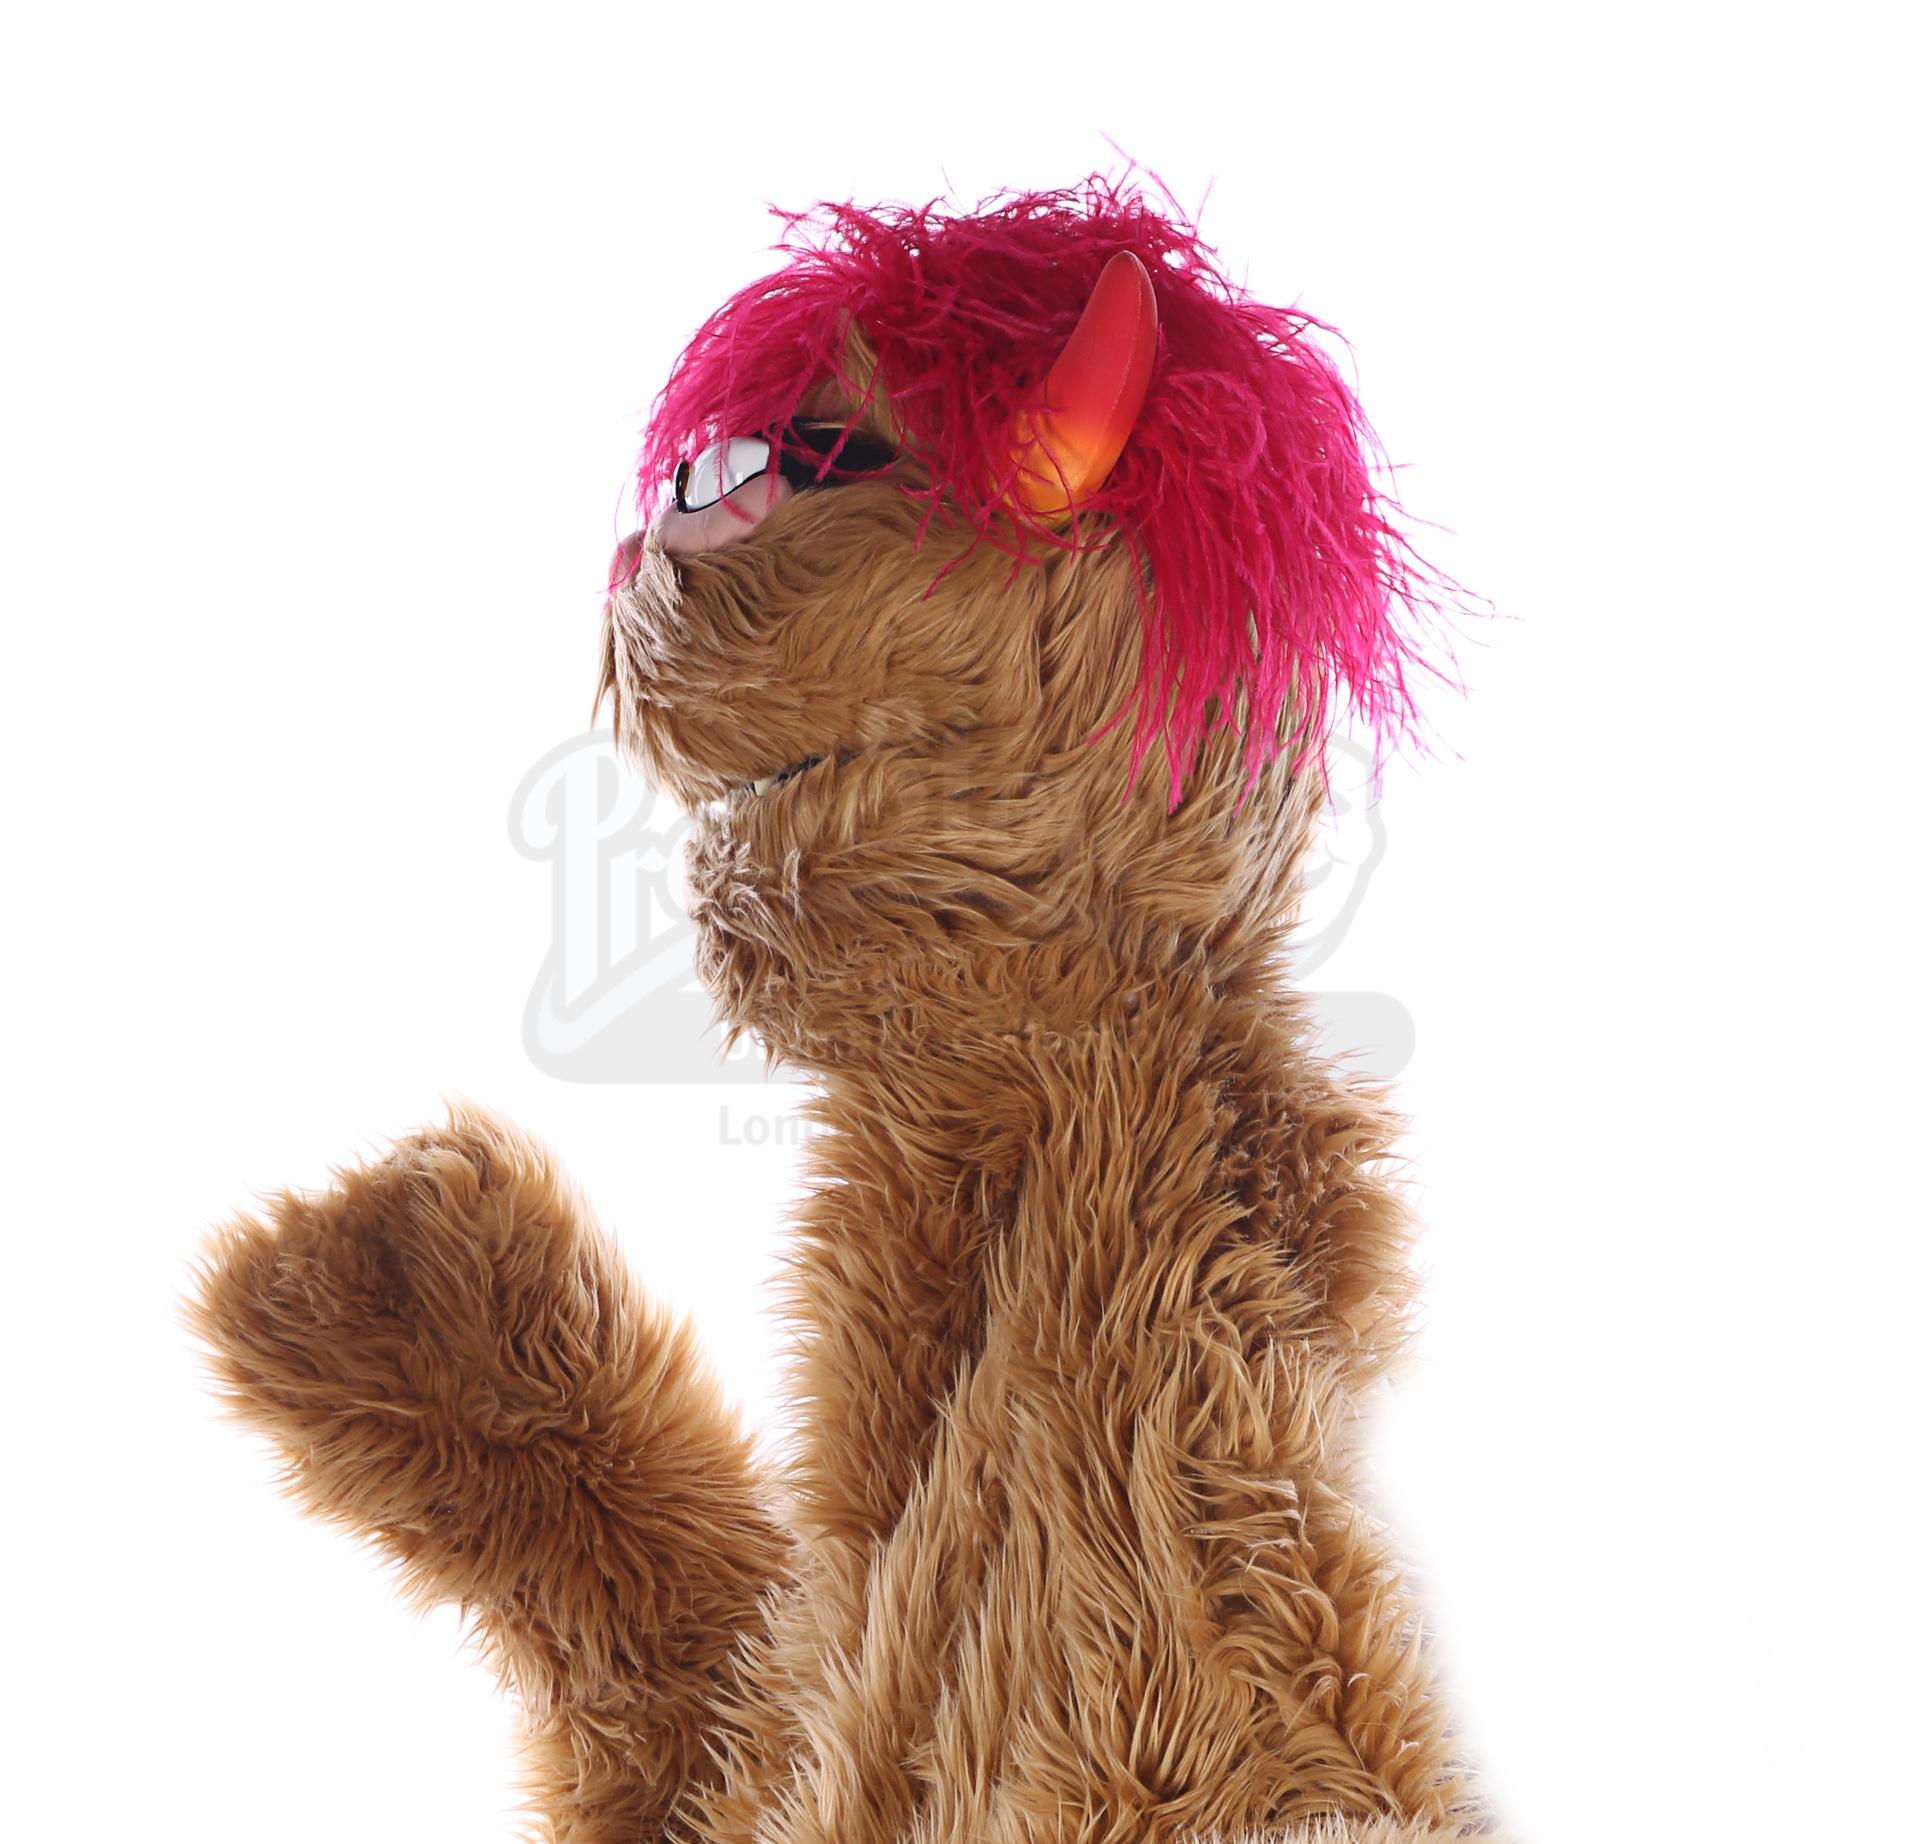 AVENUE Q (STAGE SHOW) - Trekkie Monster Puppet - Image 4 of 5